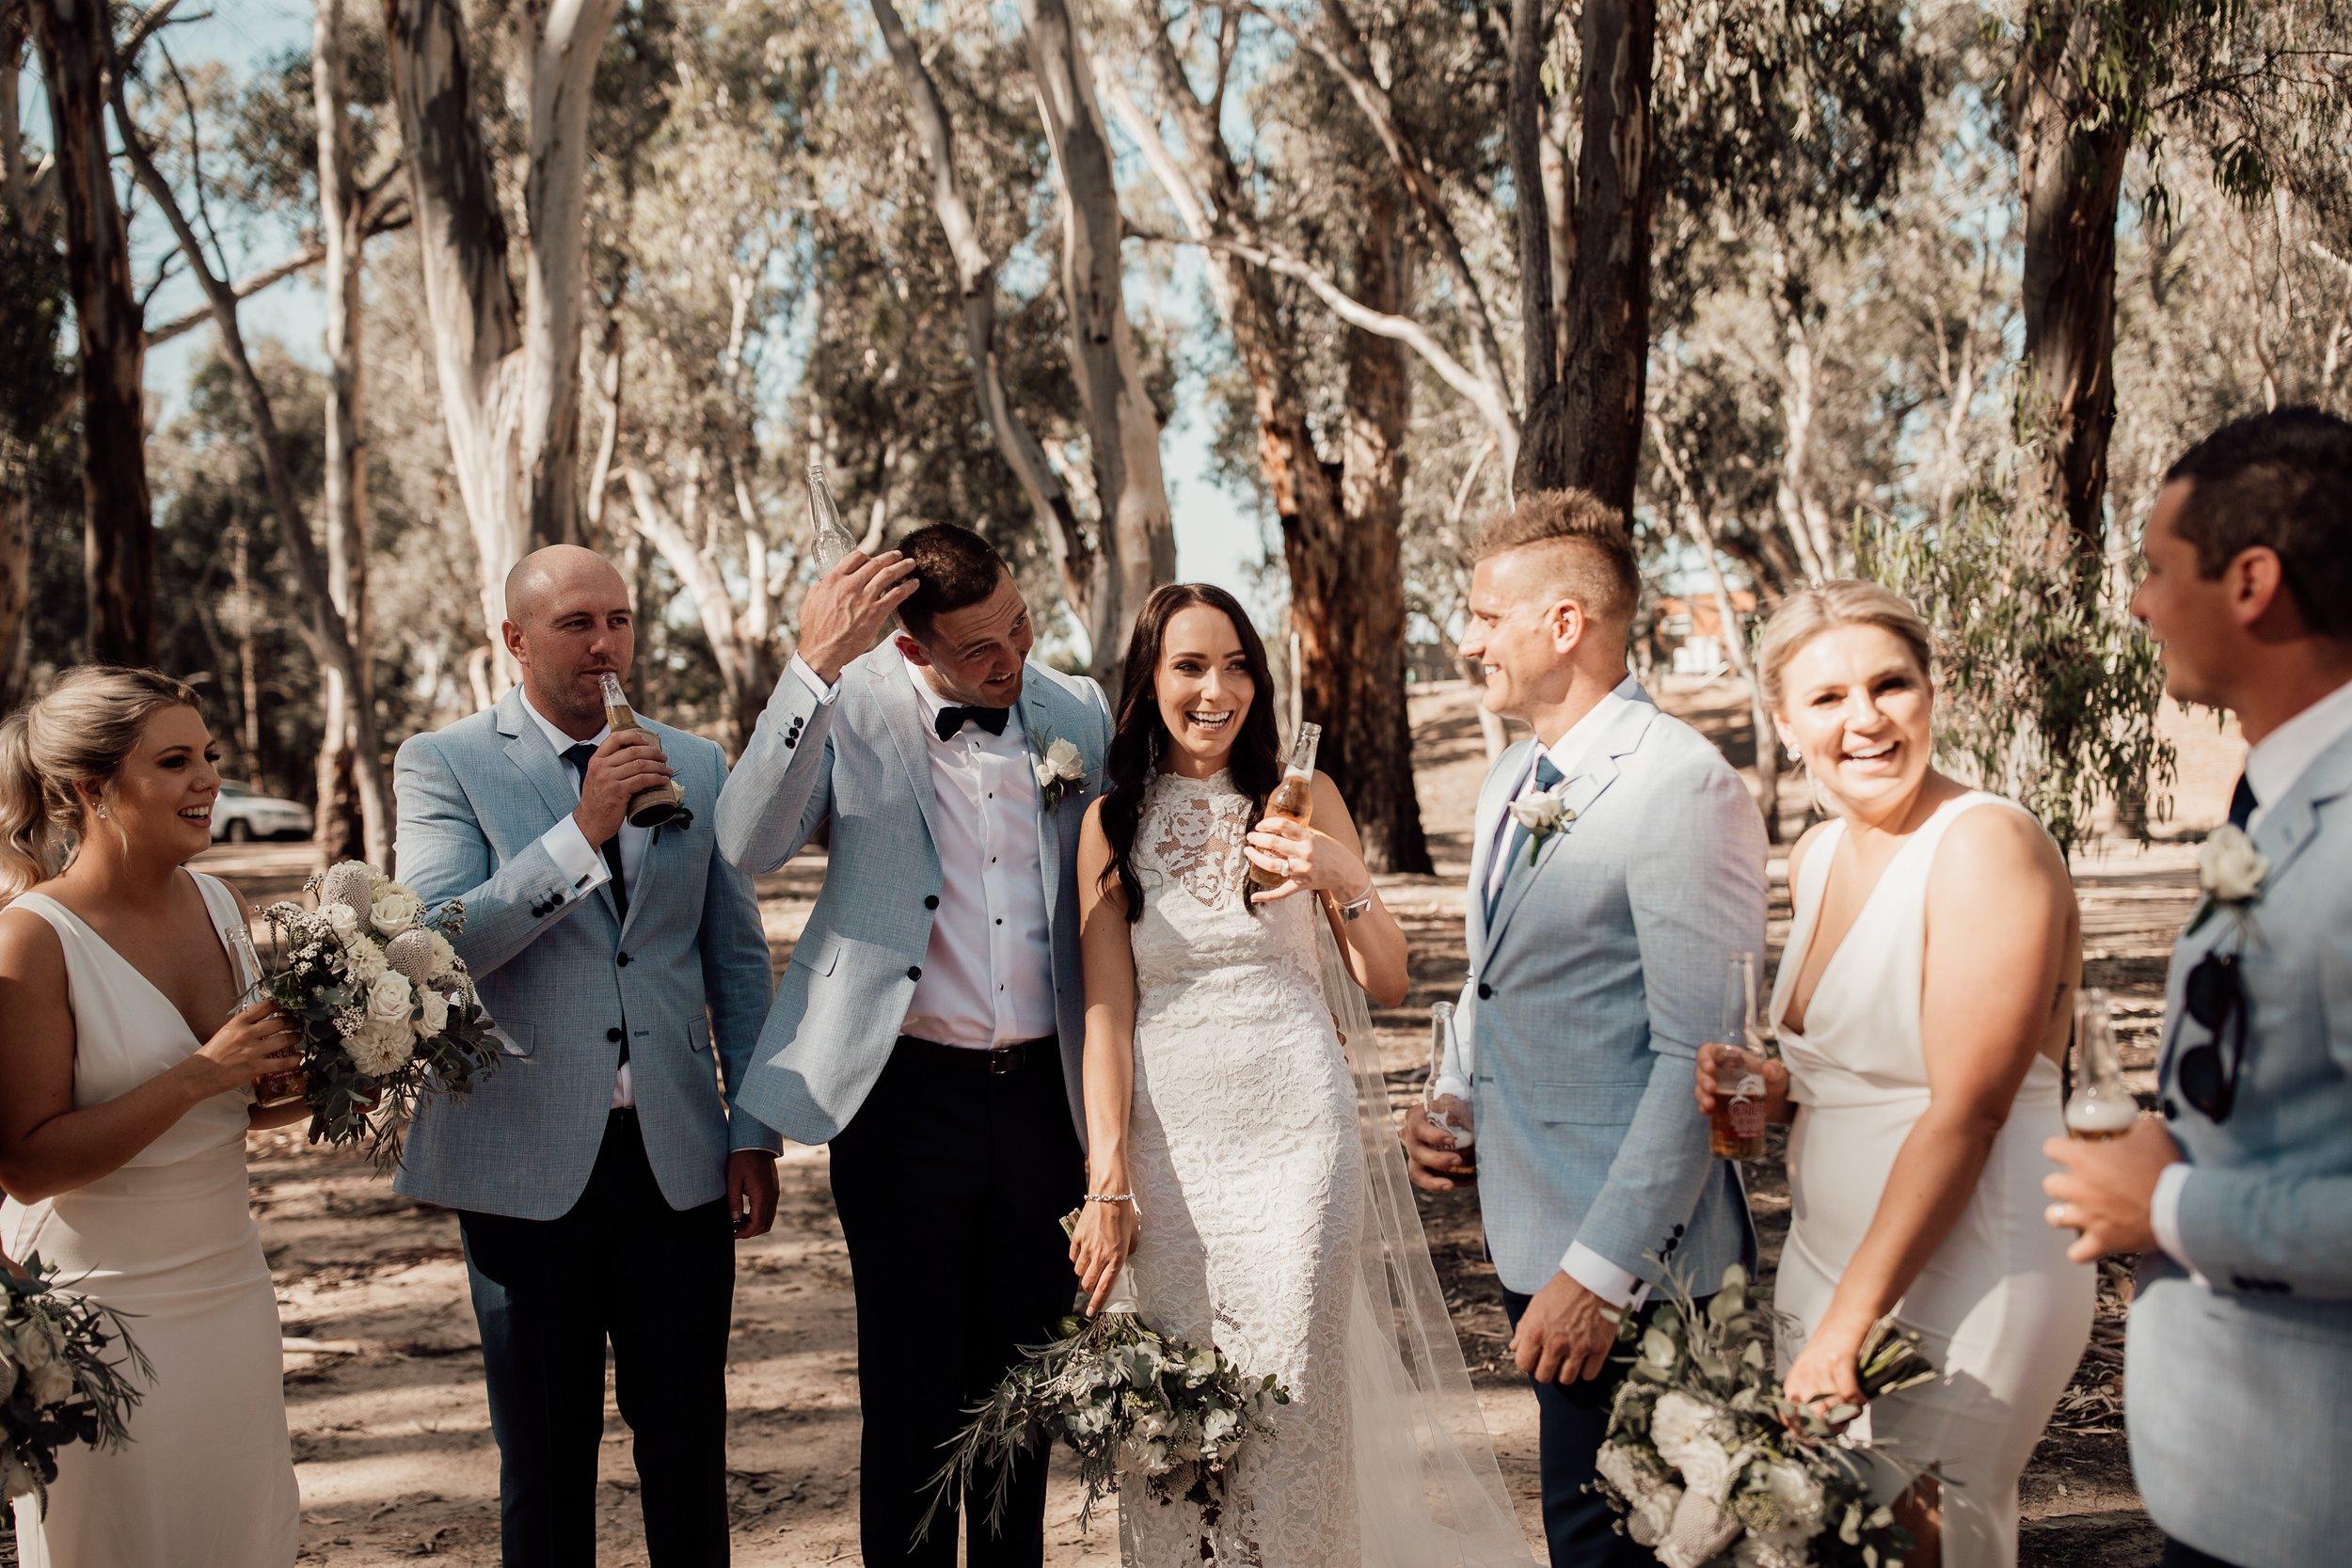 mickalathomas_puremacphotography_weddingphotographer_couplephotographer_Sheppartonphotographer_2903.jpg